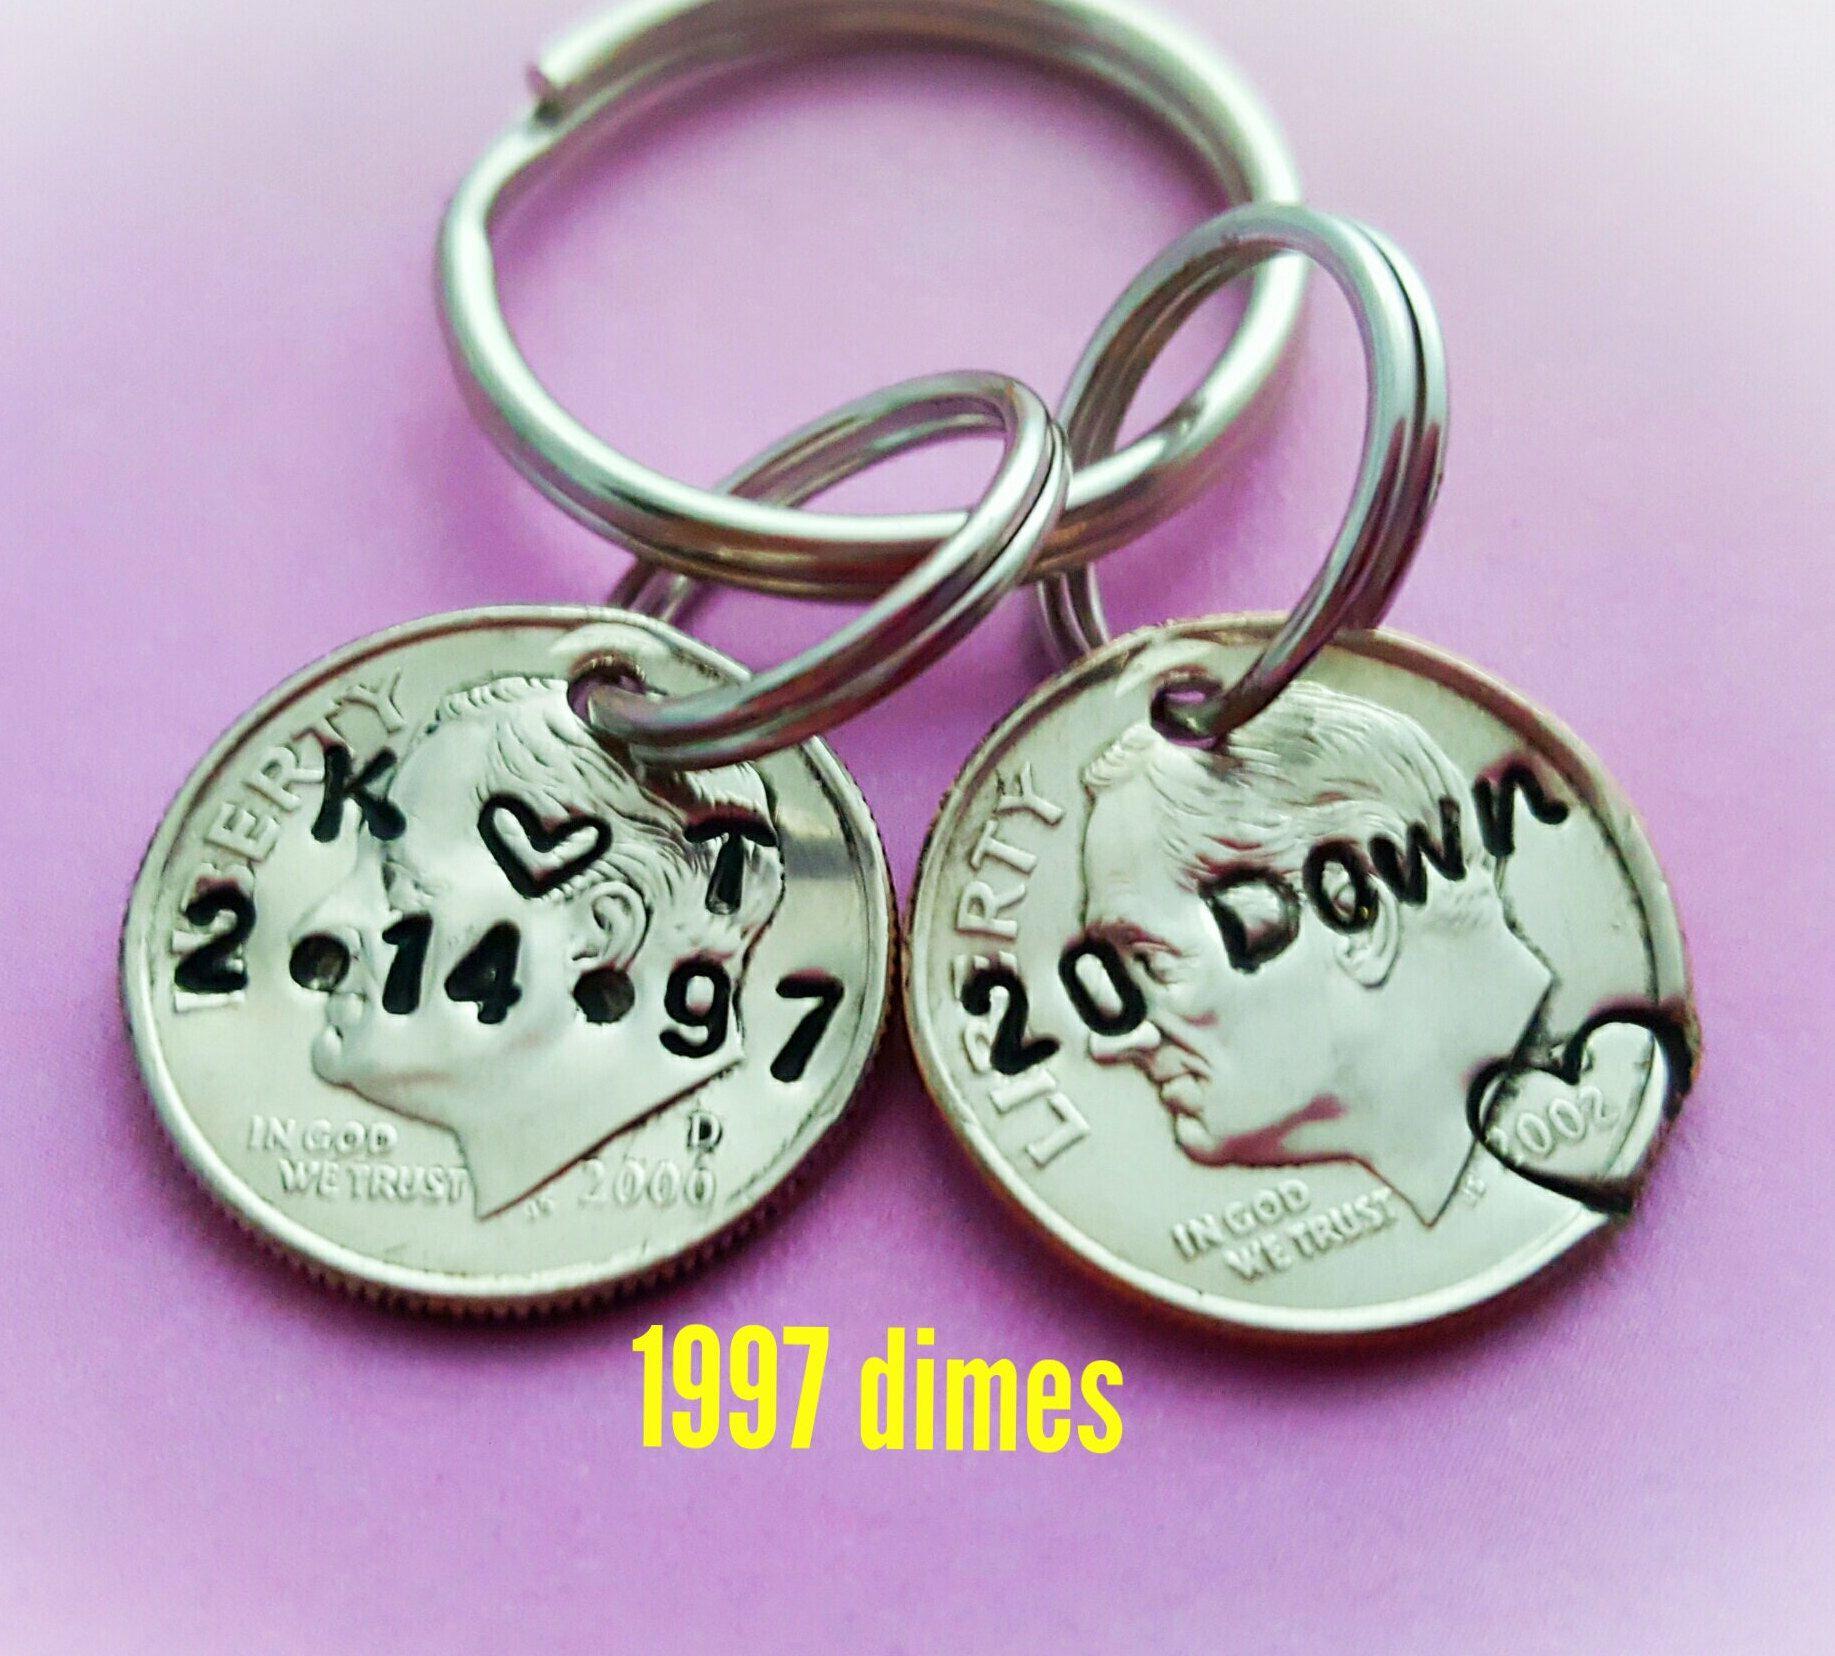 20th Anniversary Gift Idea, 20 Year Wedding Anniversary